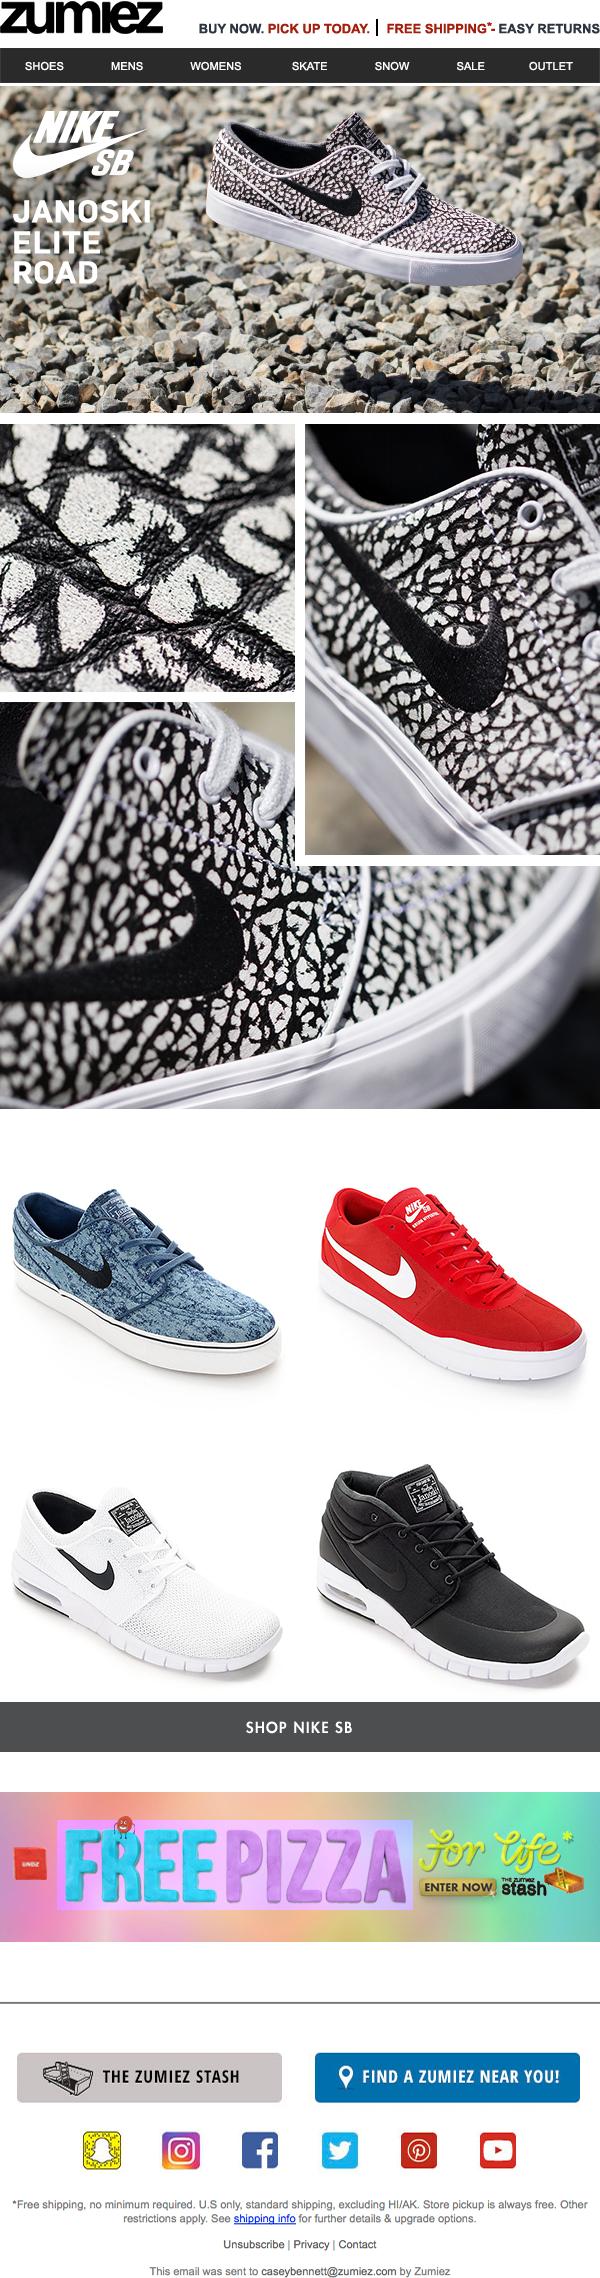 Adidas skate shoes zumiez - 20160811 Email Nike Jano Elite Elephant Png